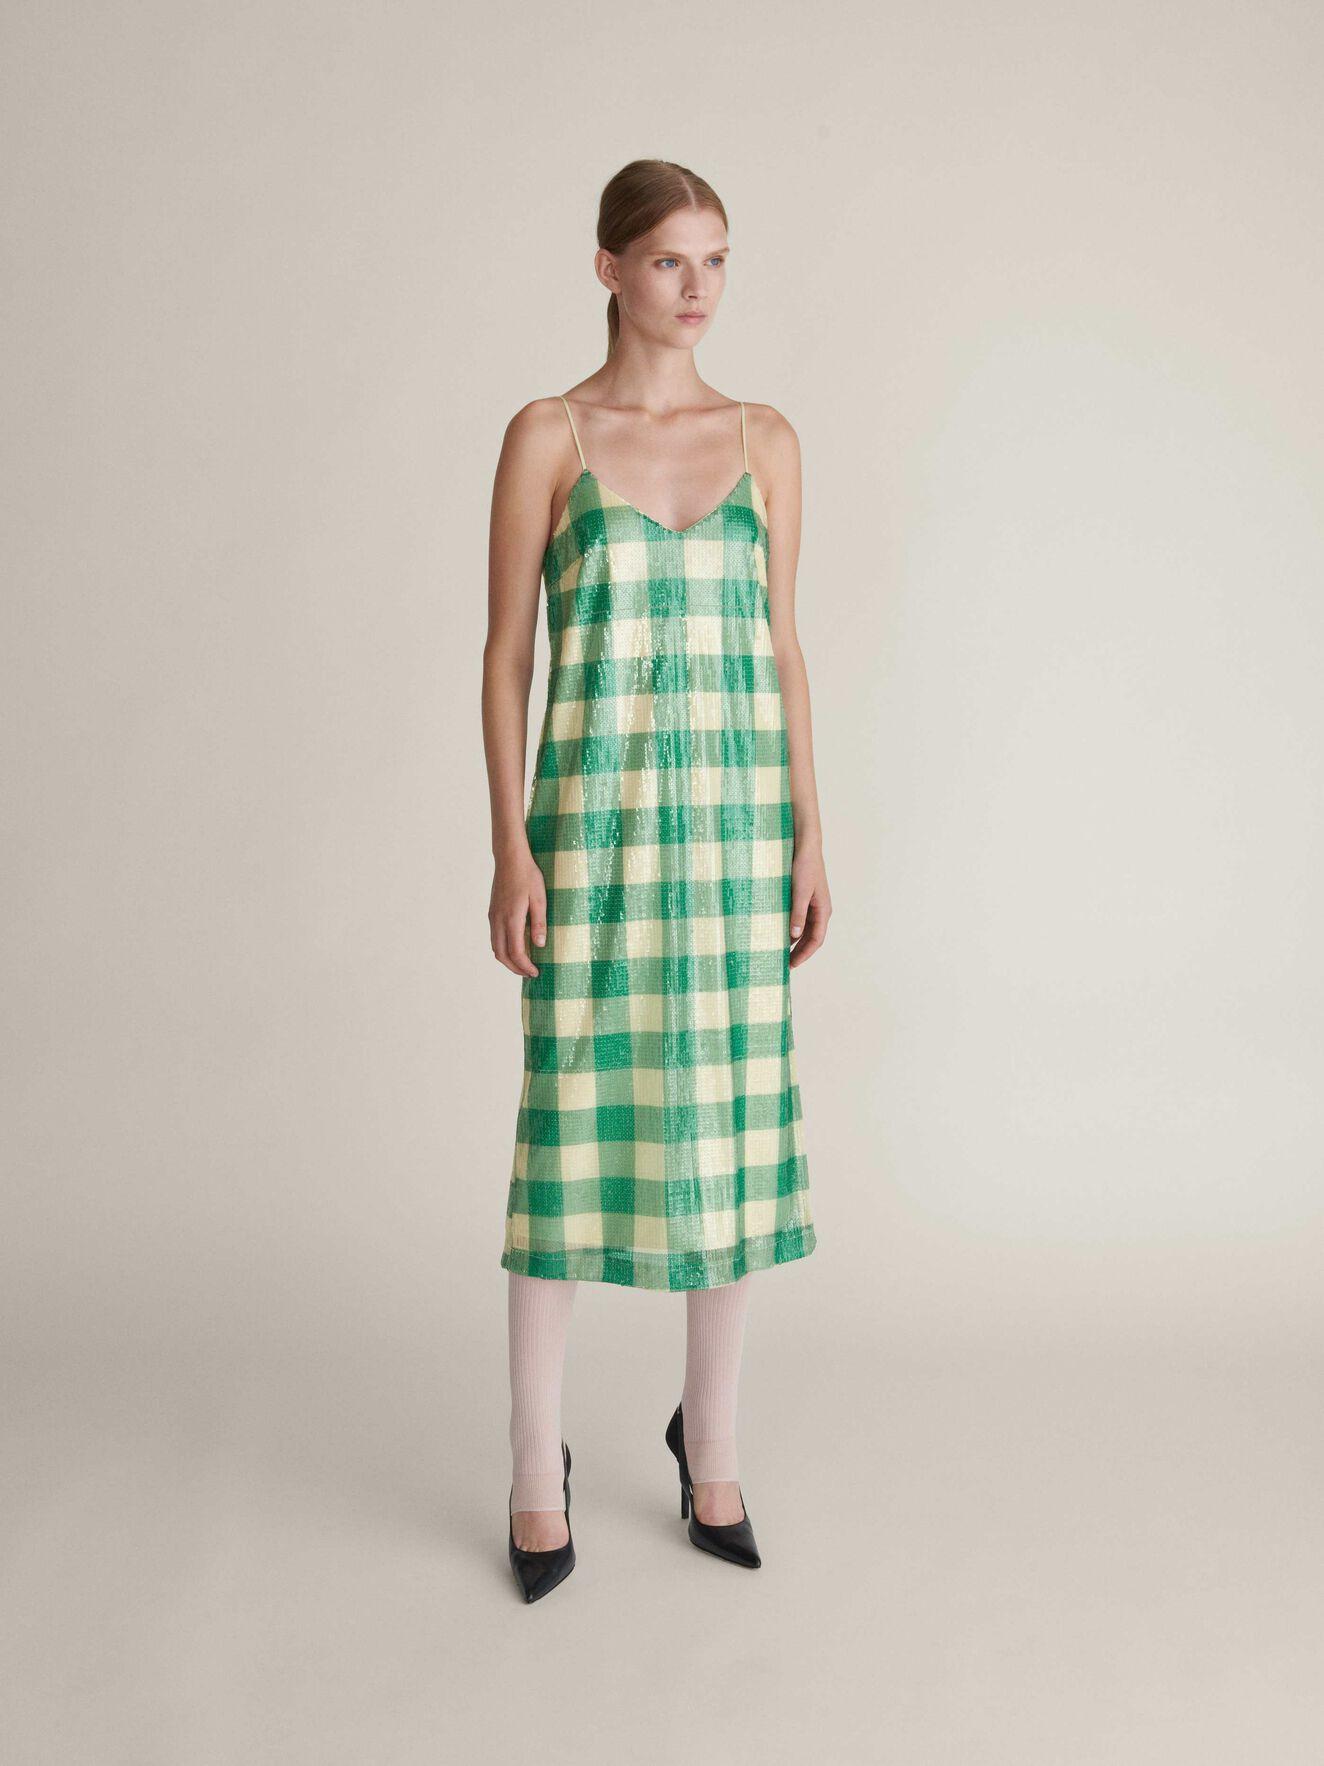 Ippis 2 Dress in ARTWORK from Tiger of Sweden